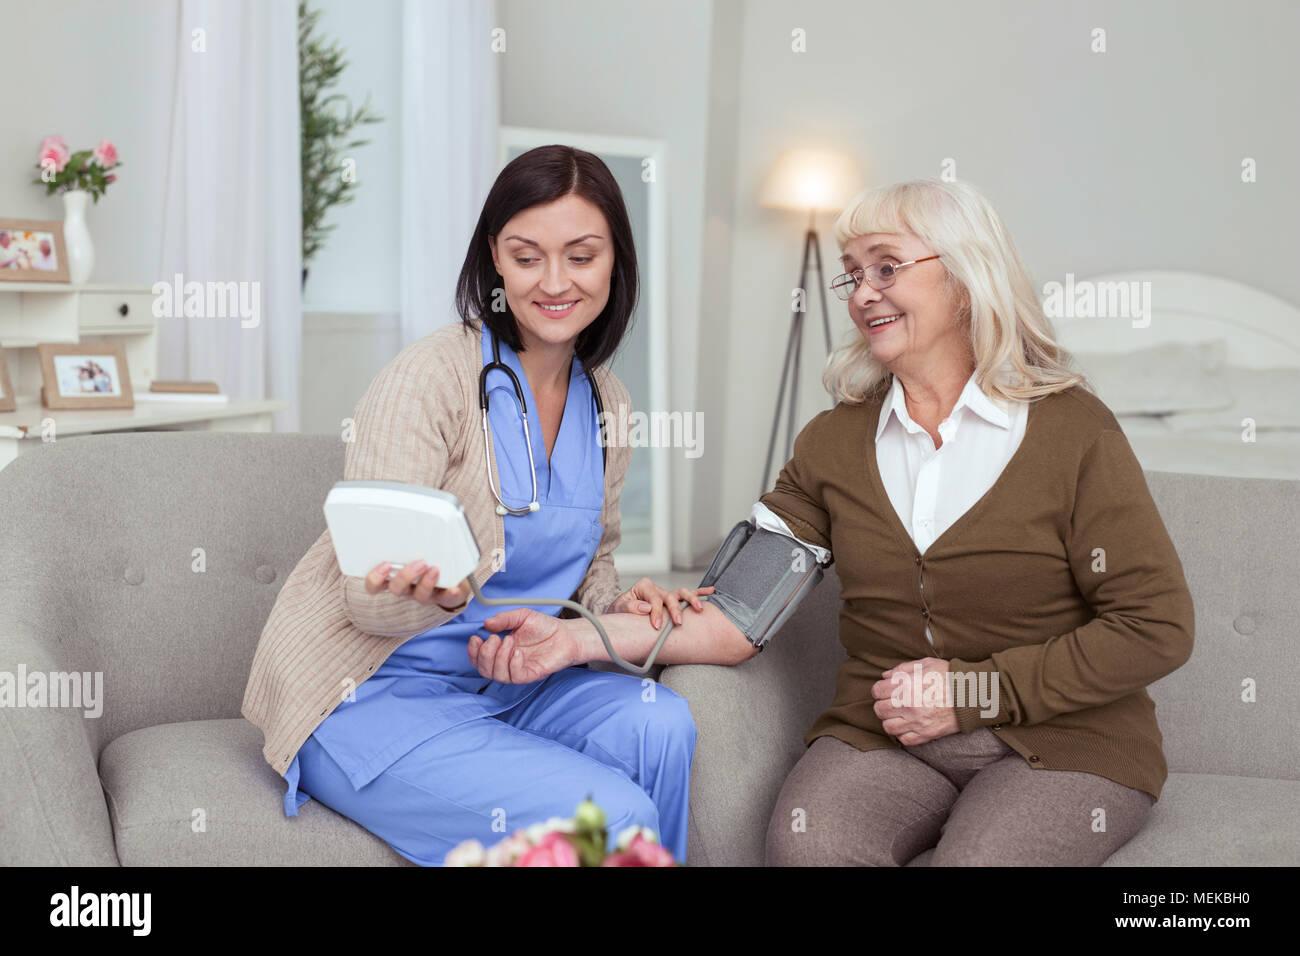 Gay female caregiver measuring blood pressure - Stock Image